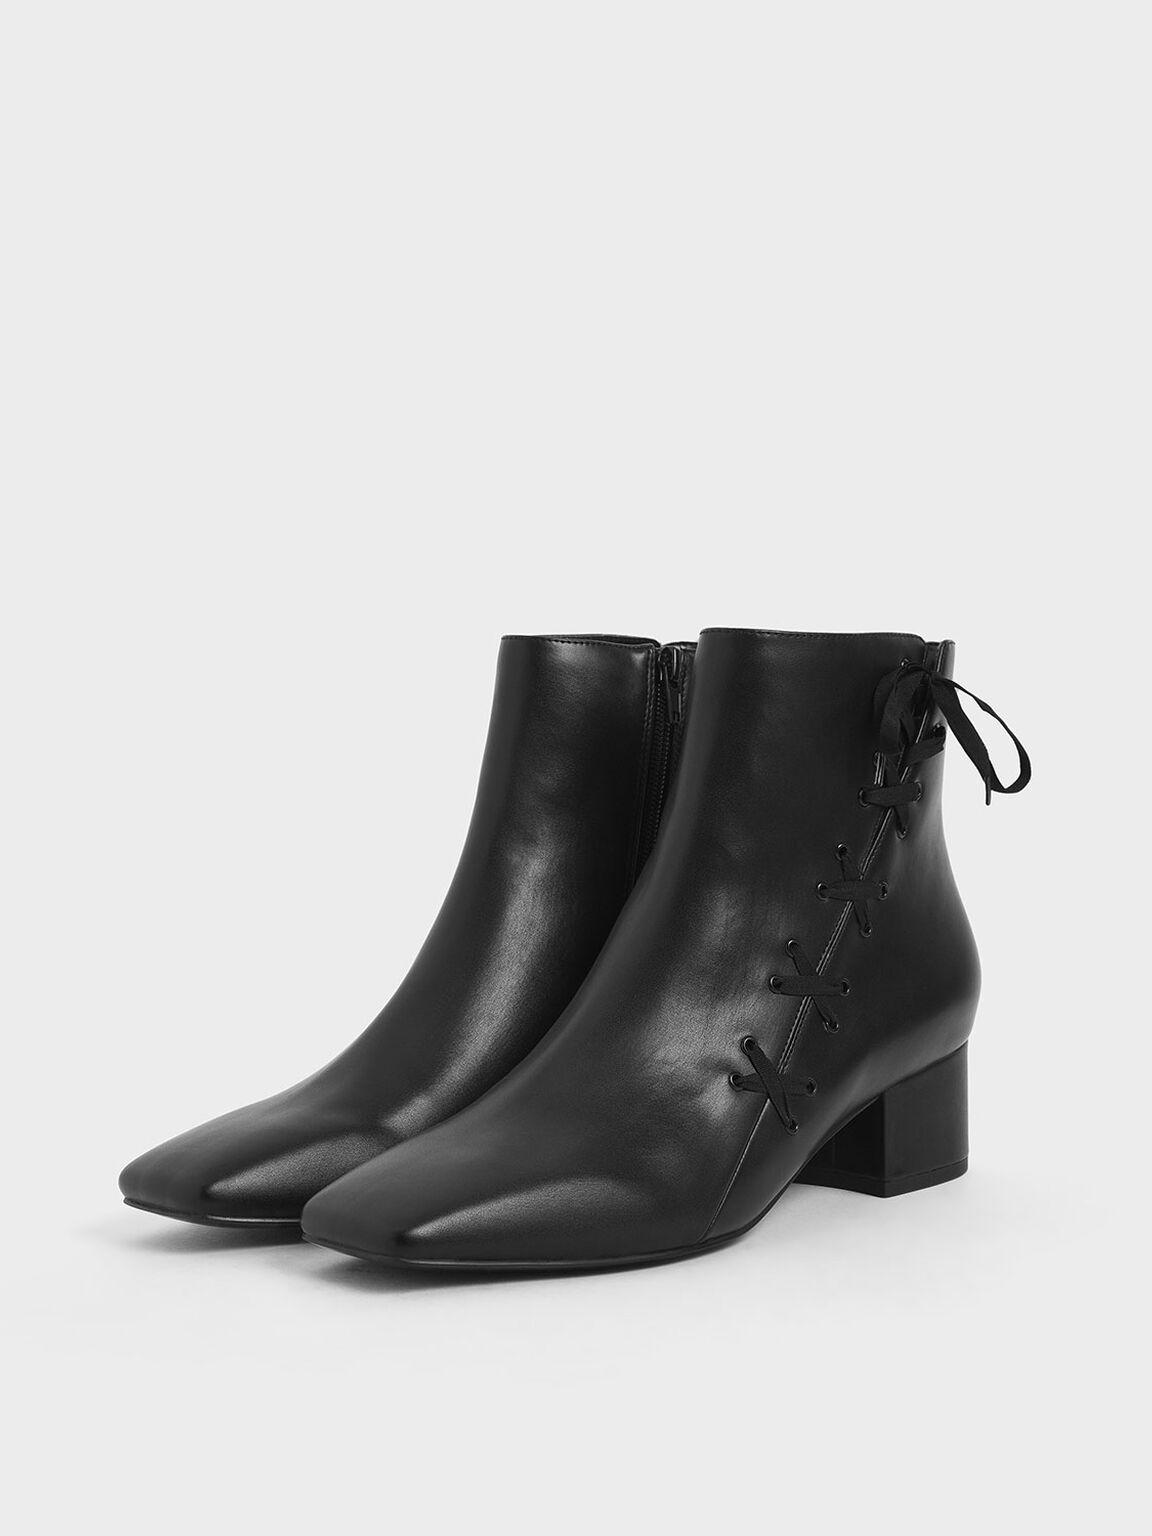 Ribbon Detail Ankle Boots, Black, hi-res